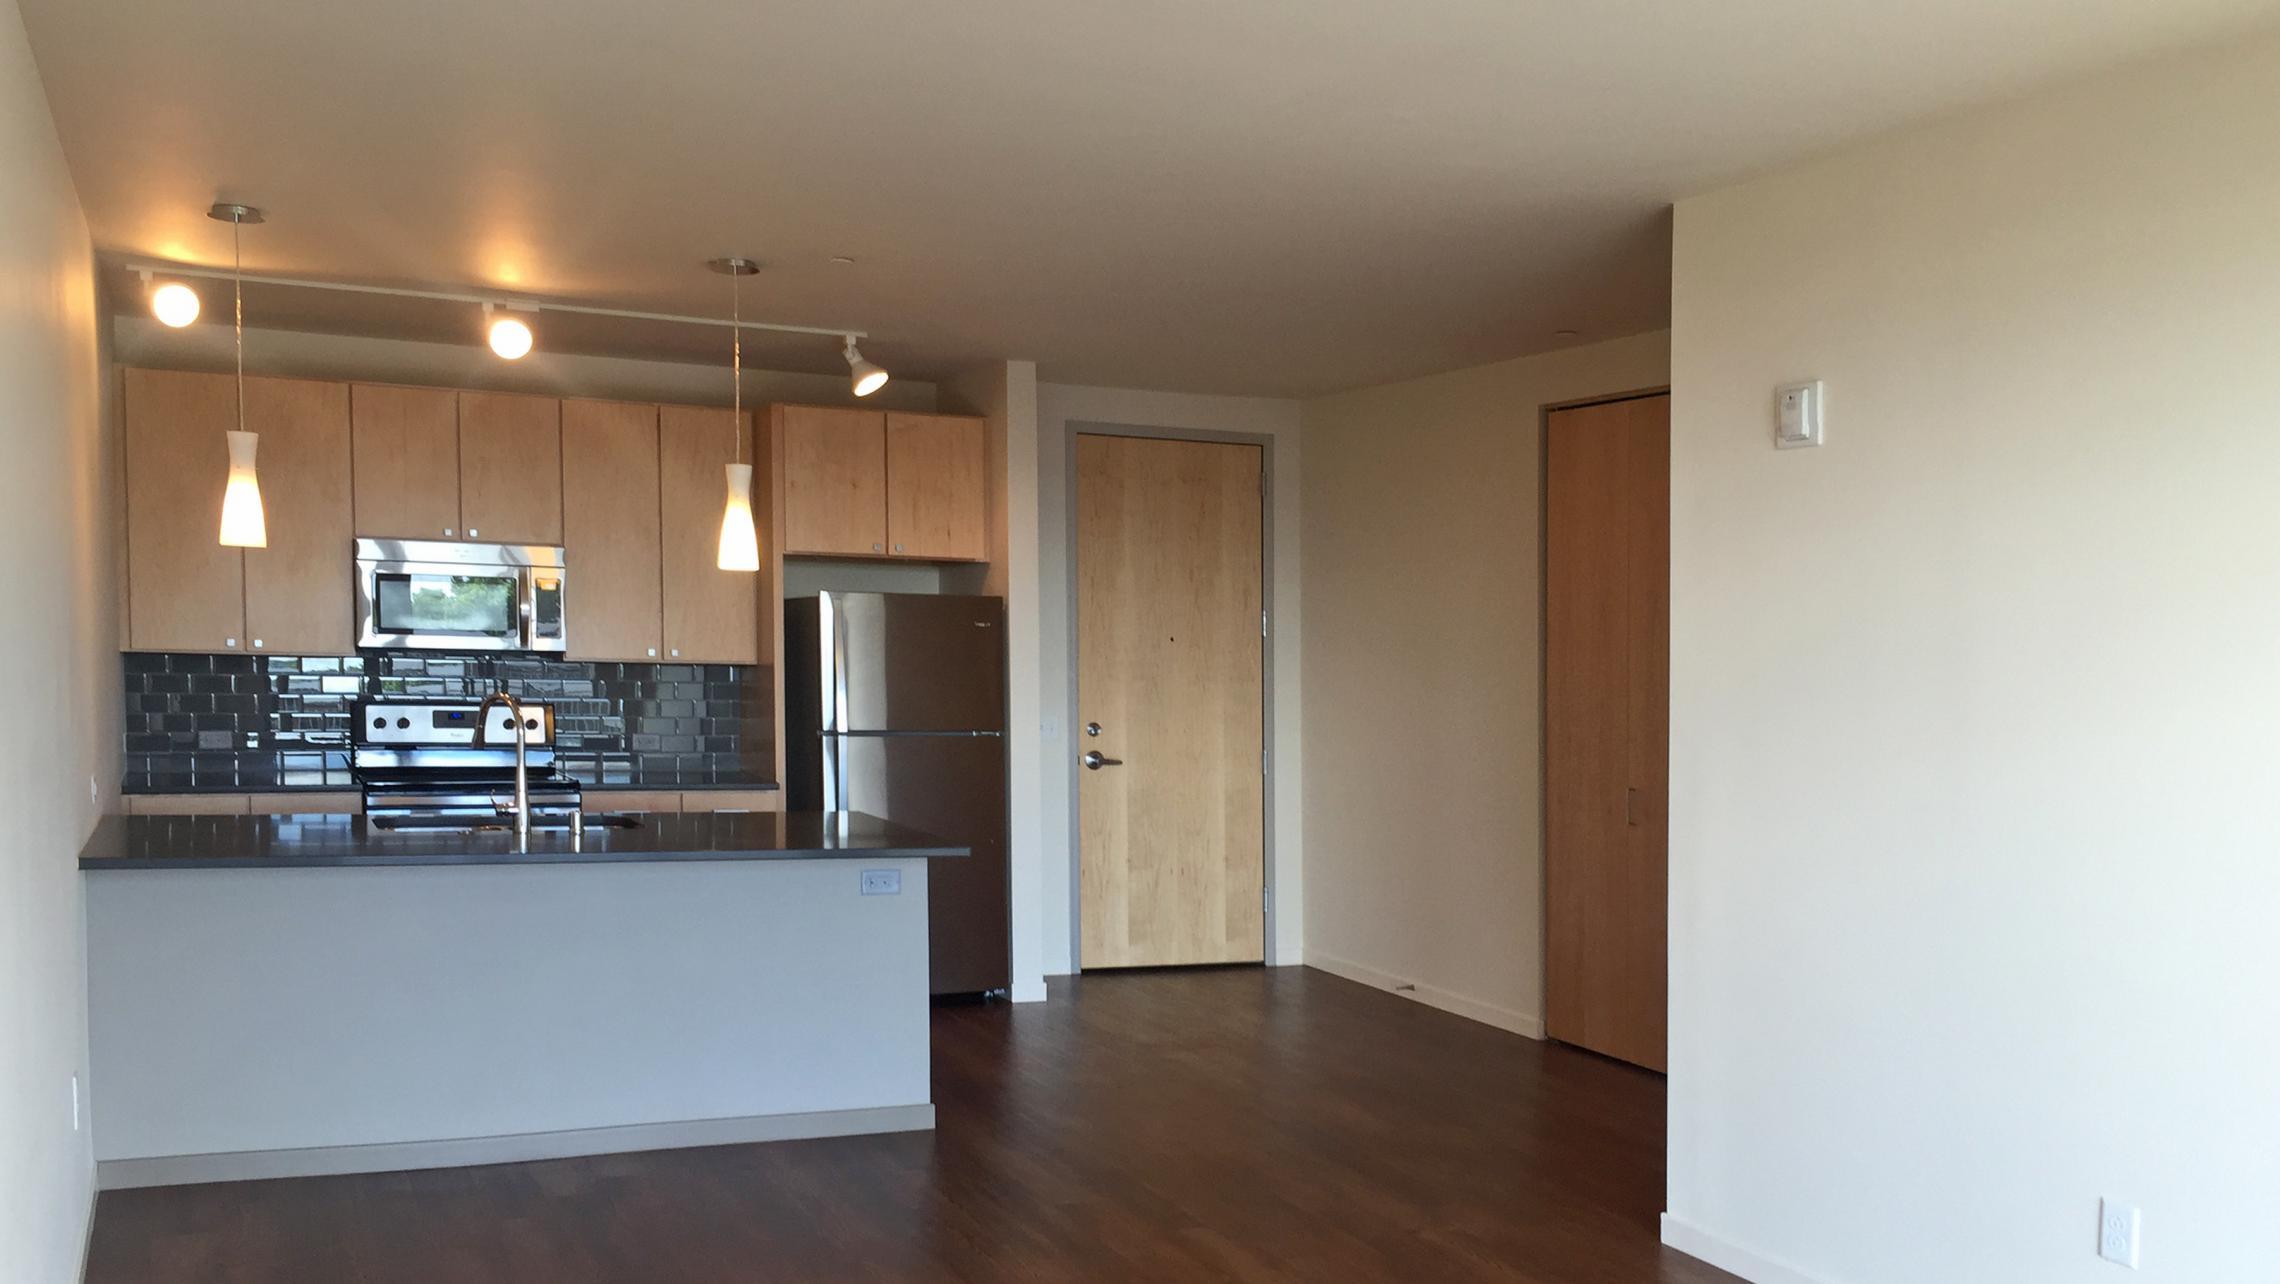 ULI Nine Line Apartment 423 - Kitchen and Living Area